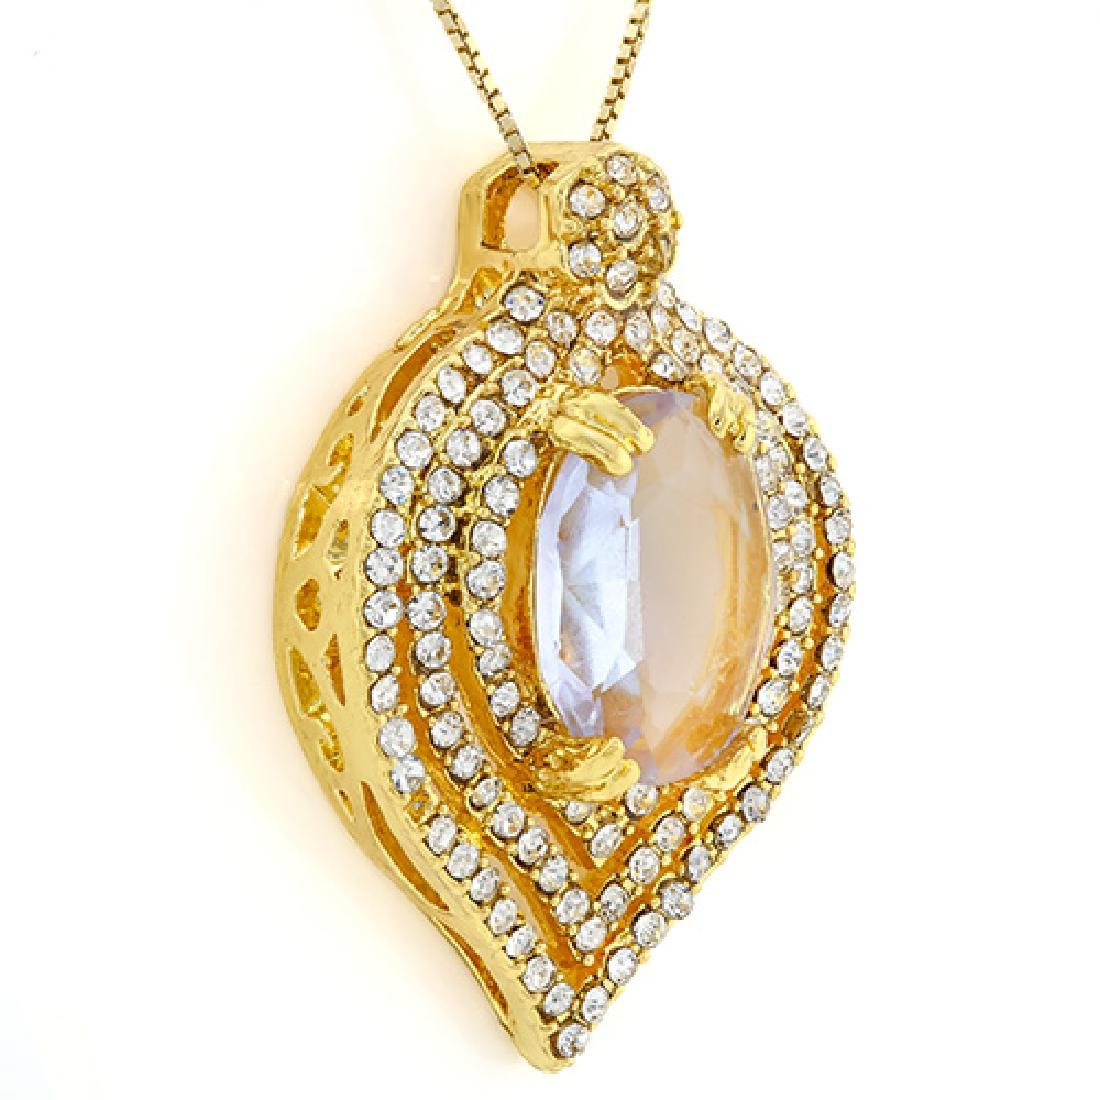 CREATED PINK AMETHYST & FLAWLESS CREATED DIAMOND 18K GO